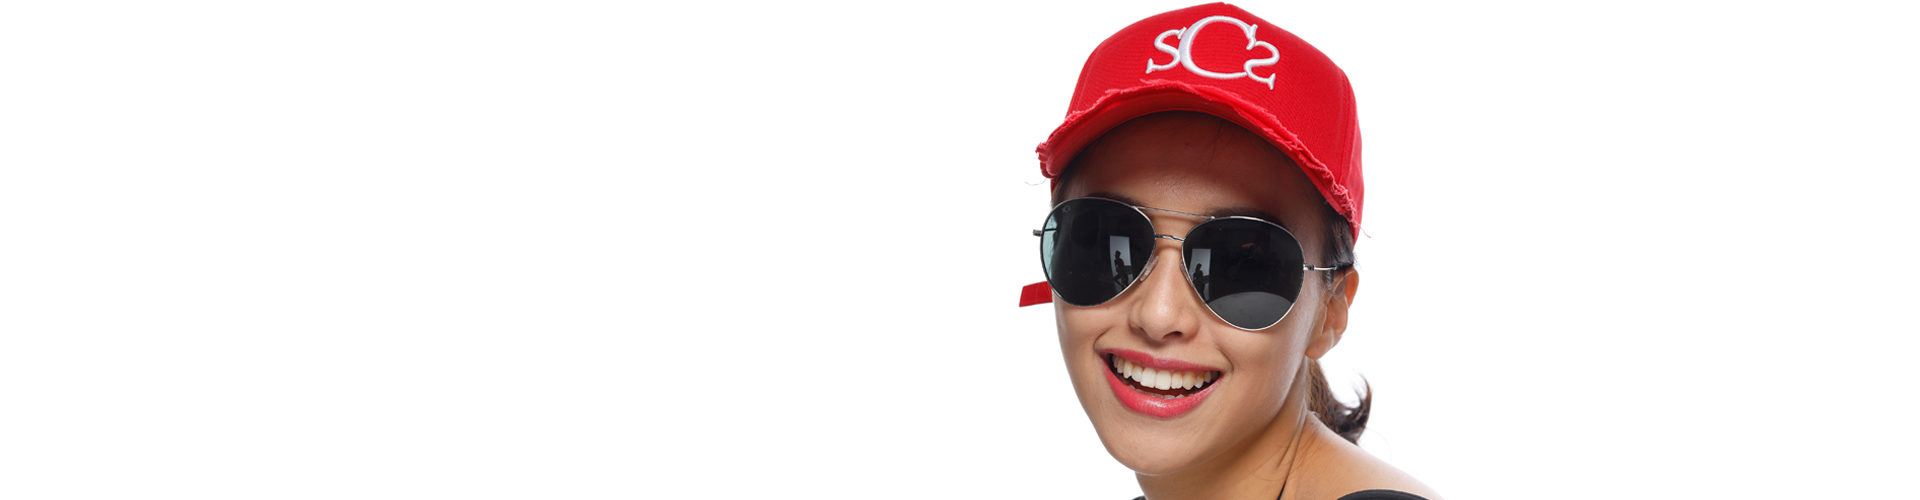 scs-main-banner-caps